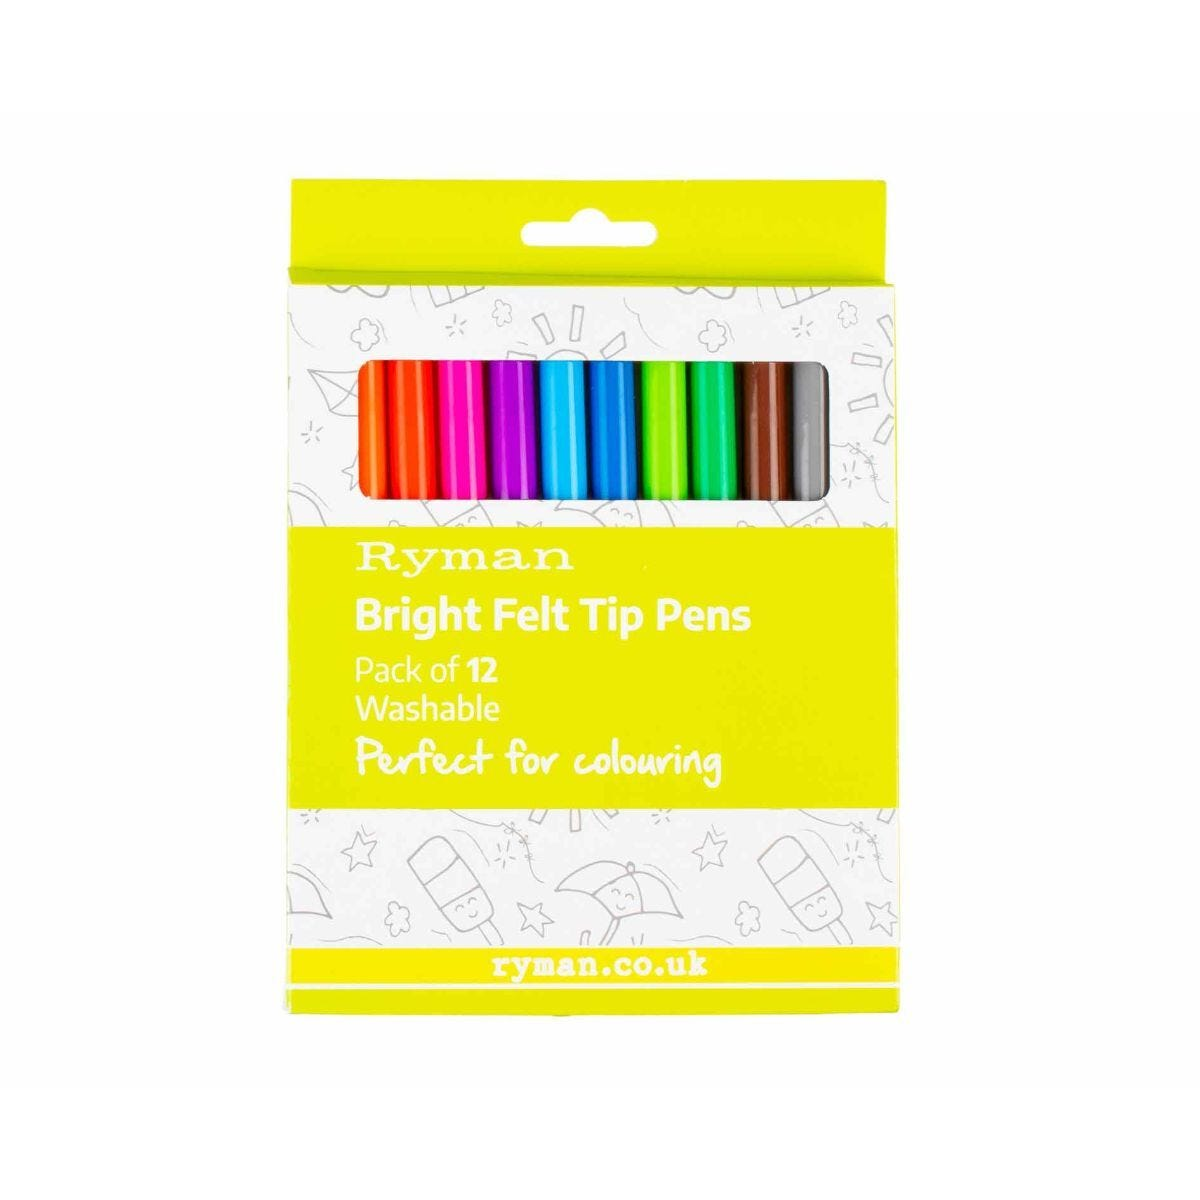 Ryman Bright Felt Tip Pens Pack of 12